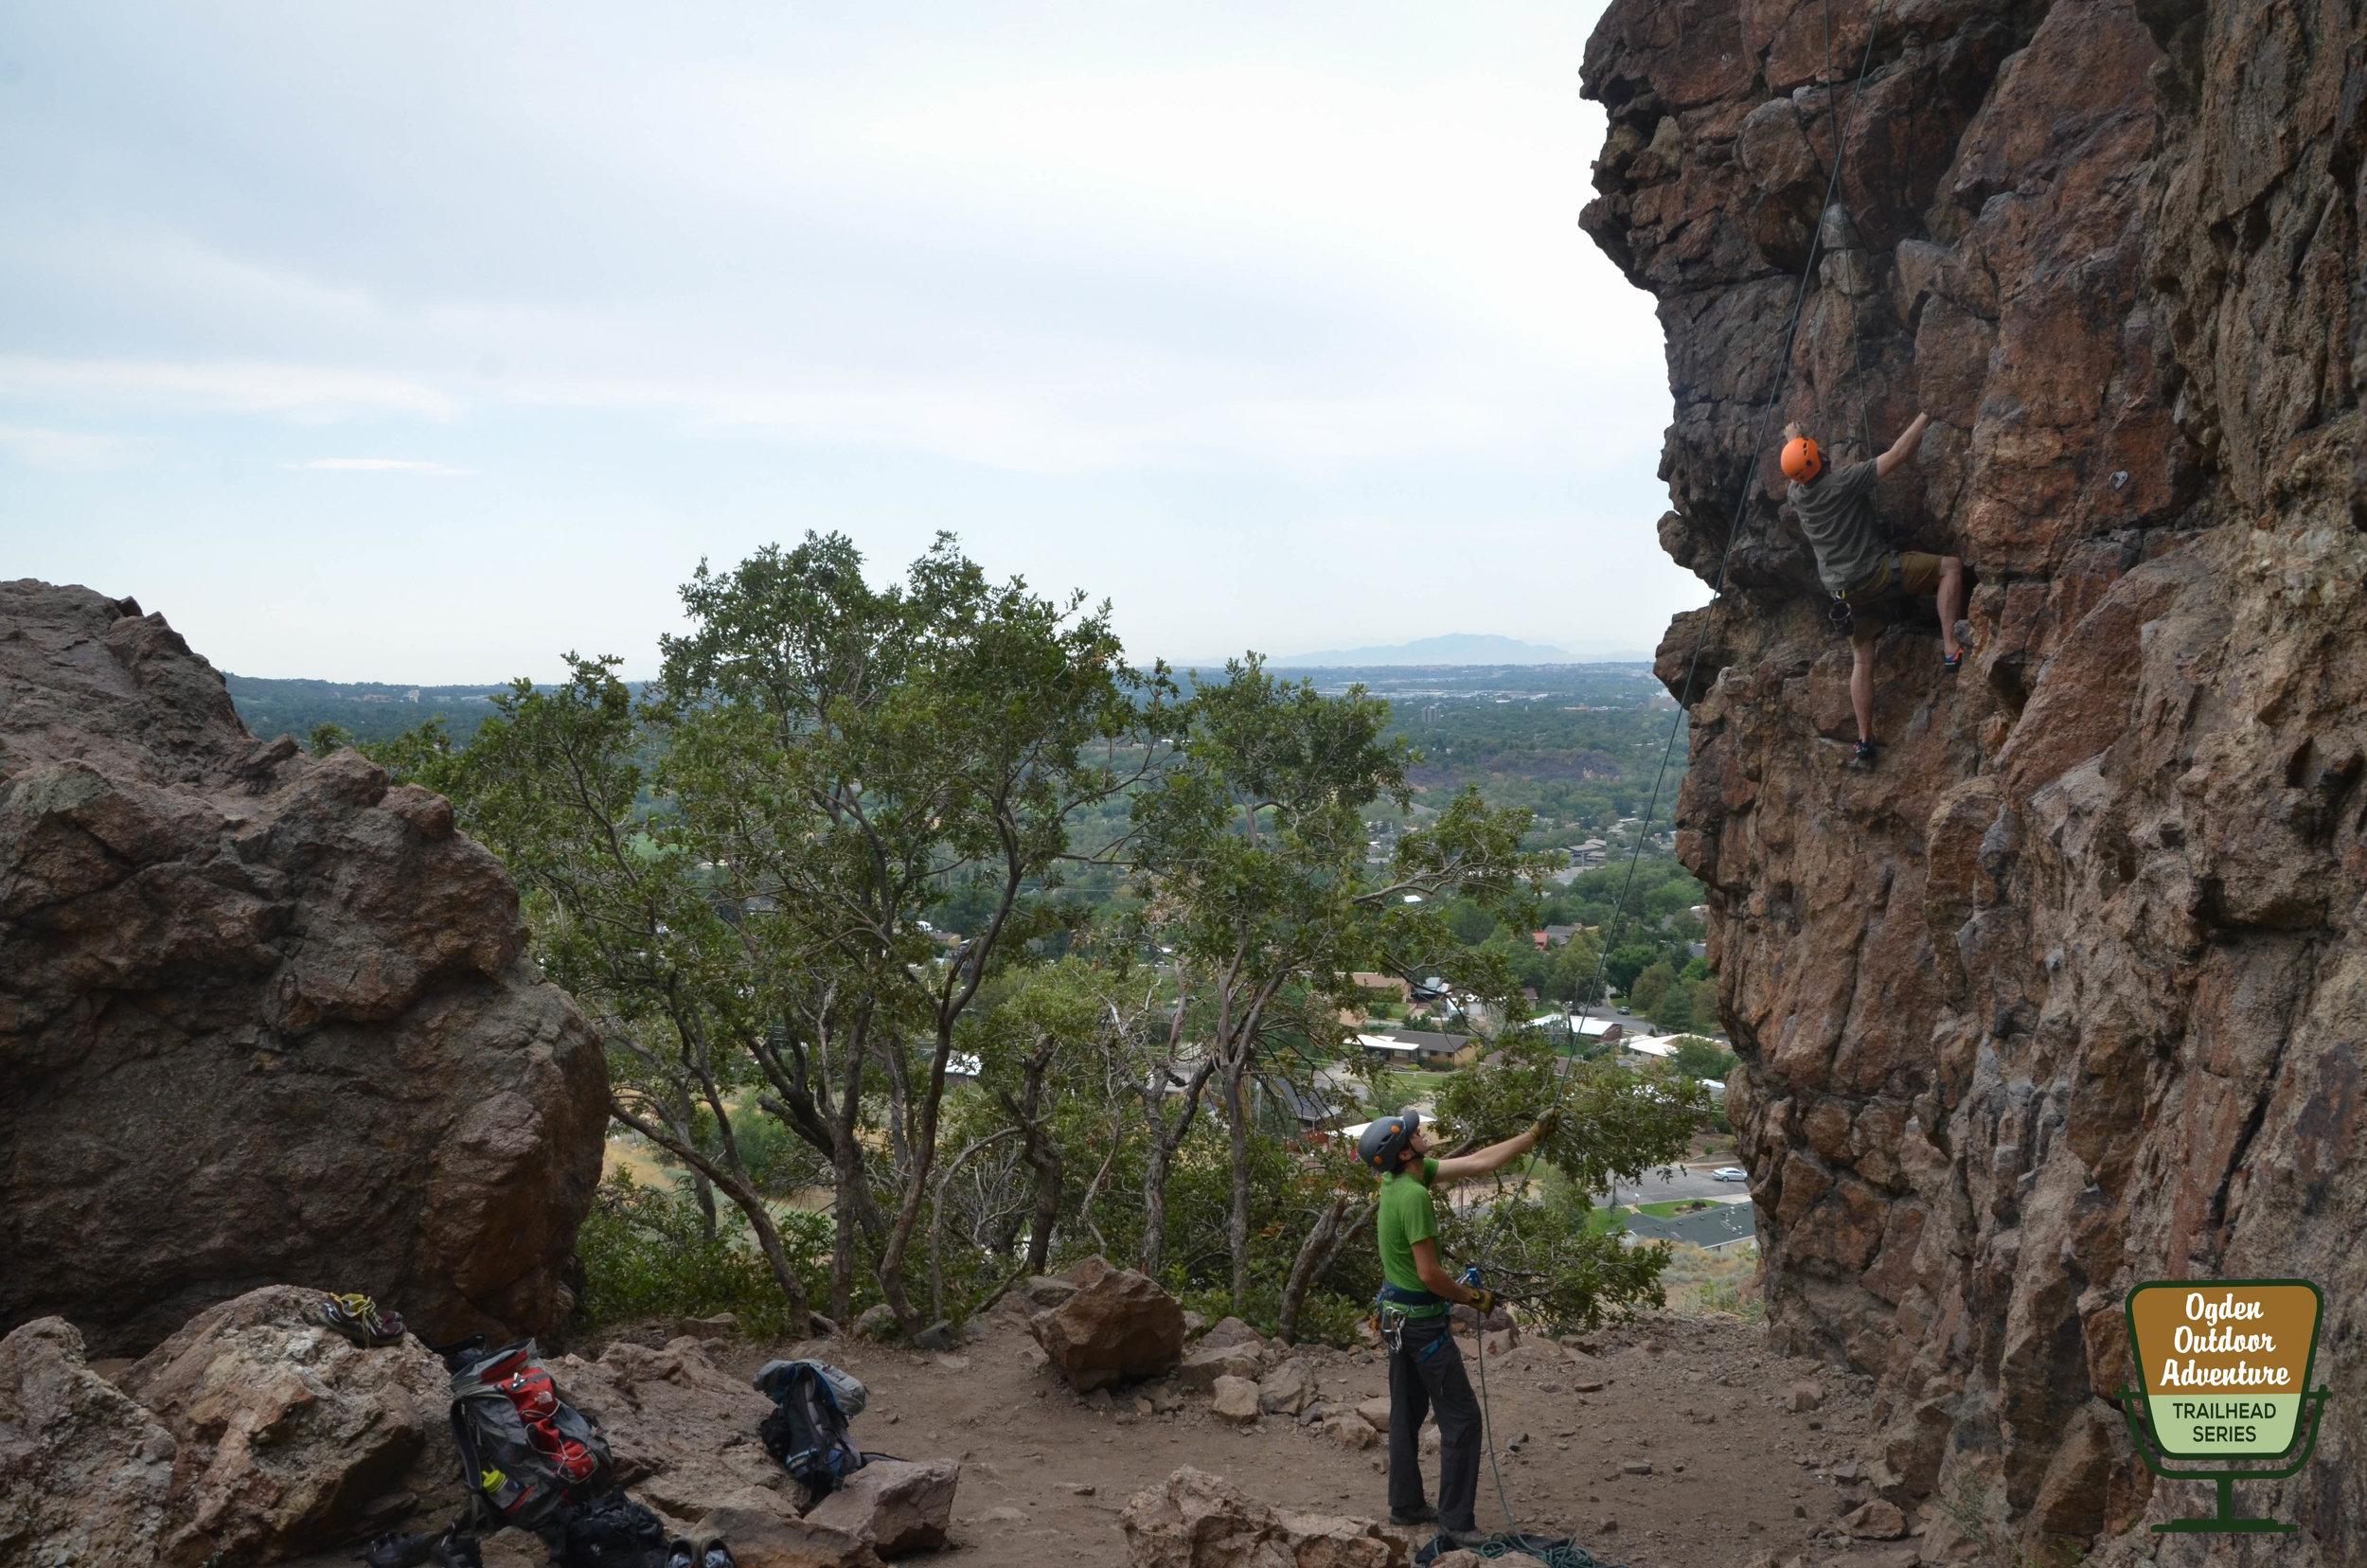 Ogden Outdoor Adventure Show 248 - Bear House Mountaineering-19.jpg